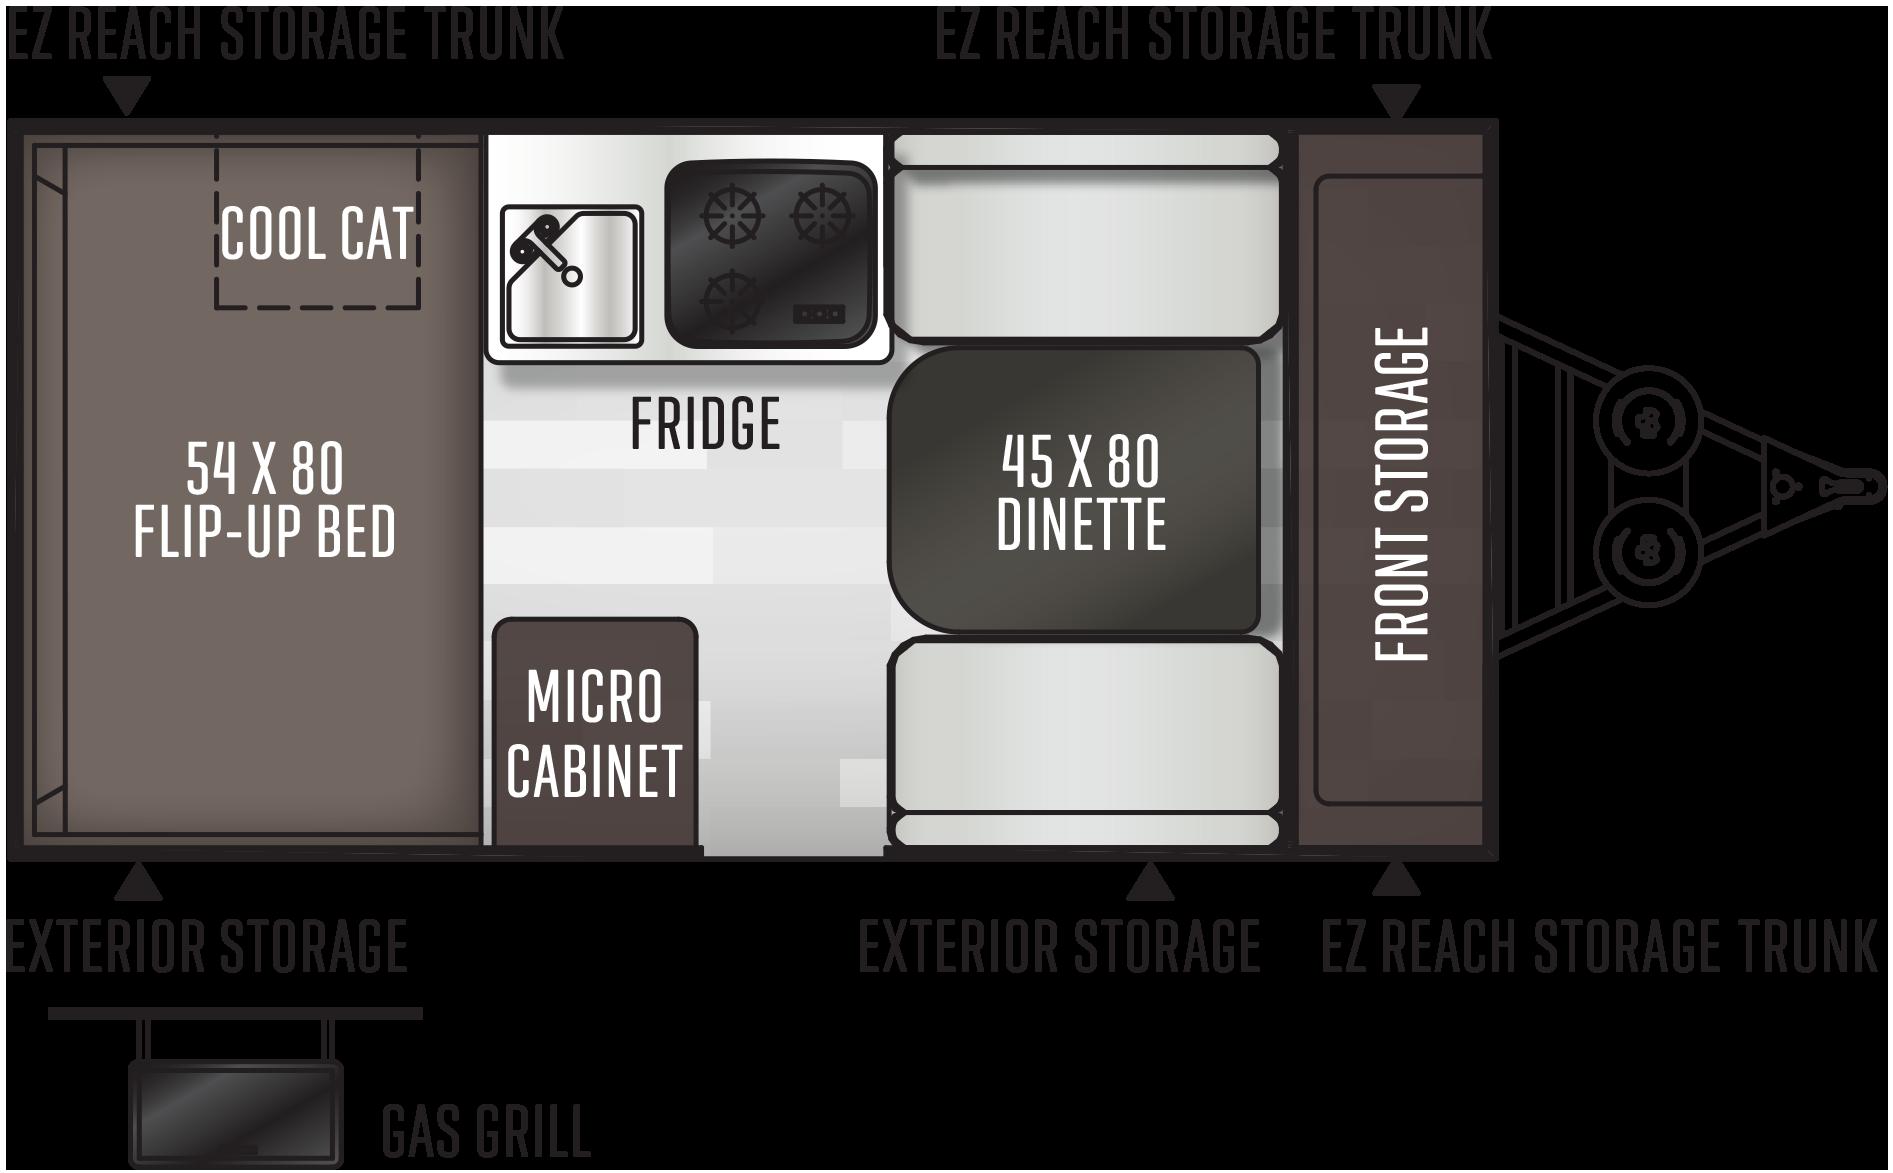 T12rbst Floorplan